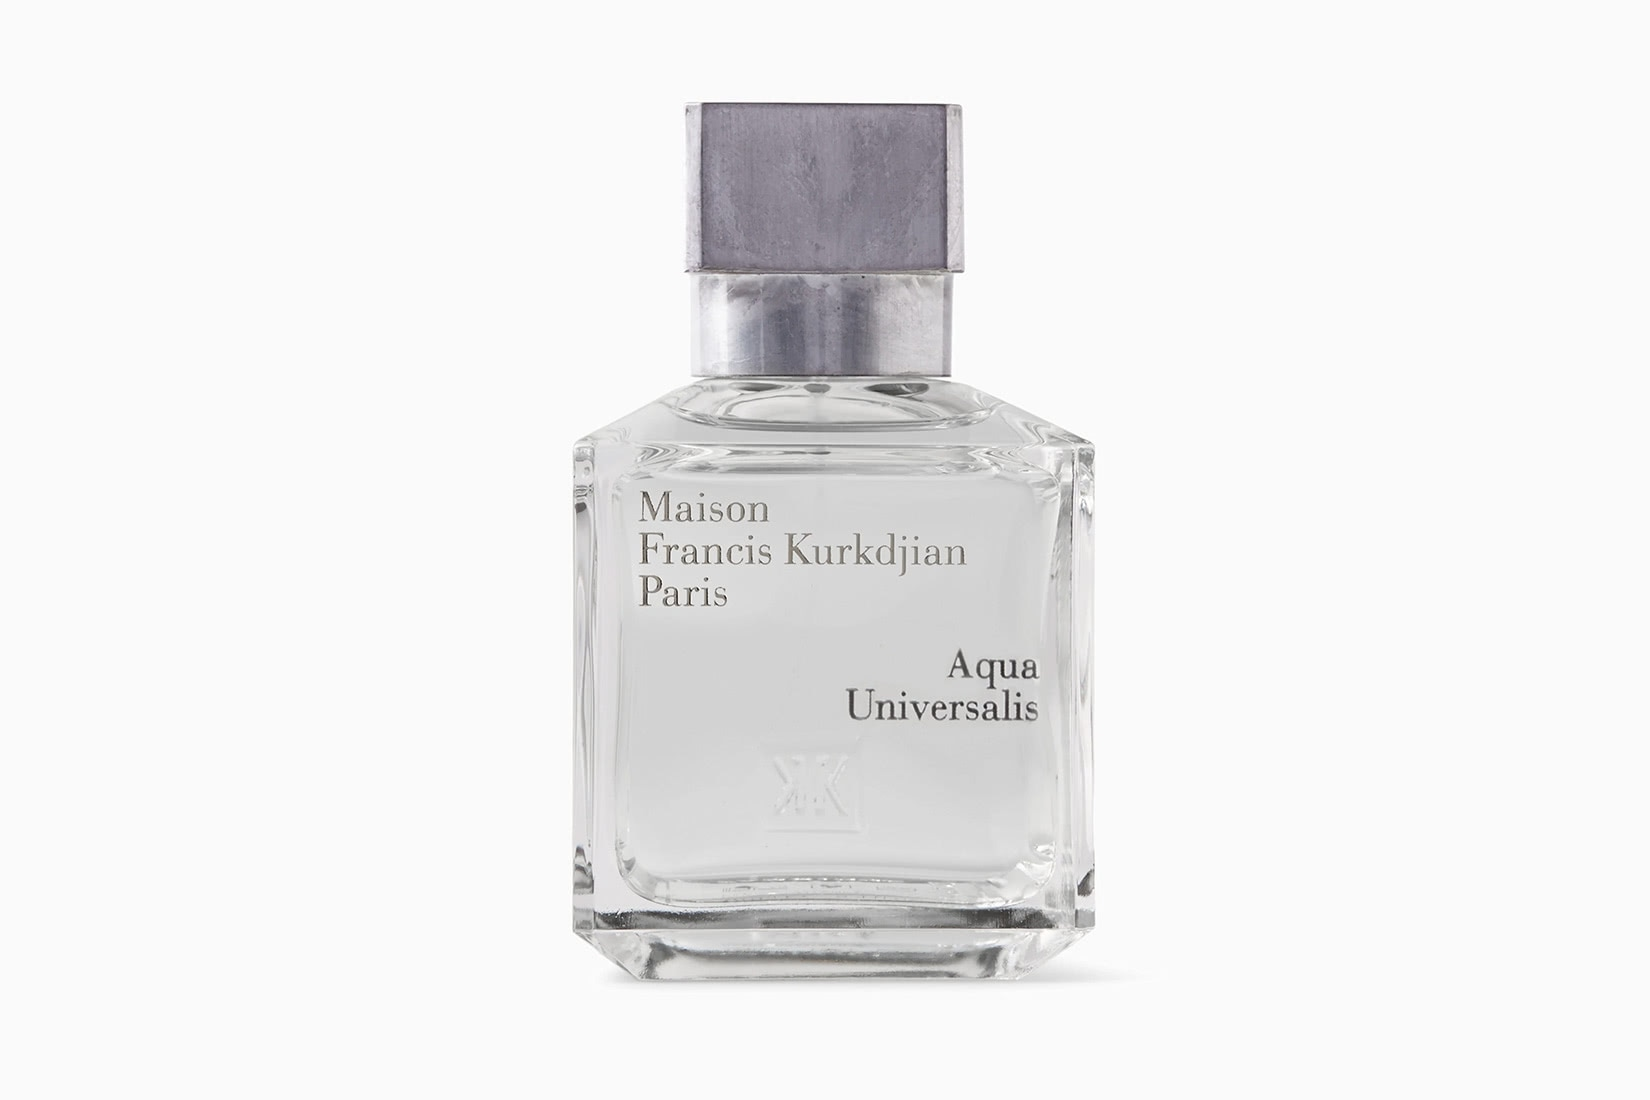 best men cologne maison francis kurkdjian aqua universalis - Luxe Digital